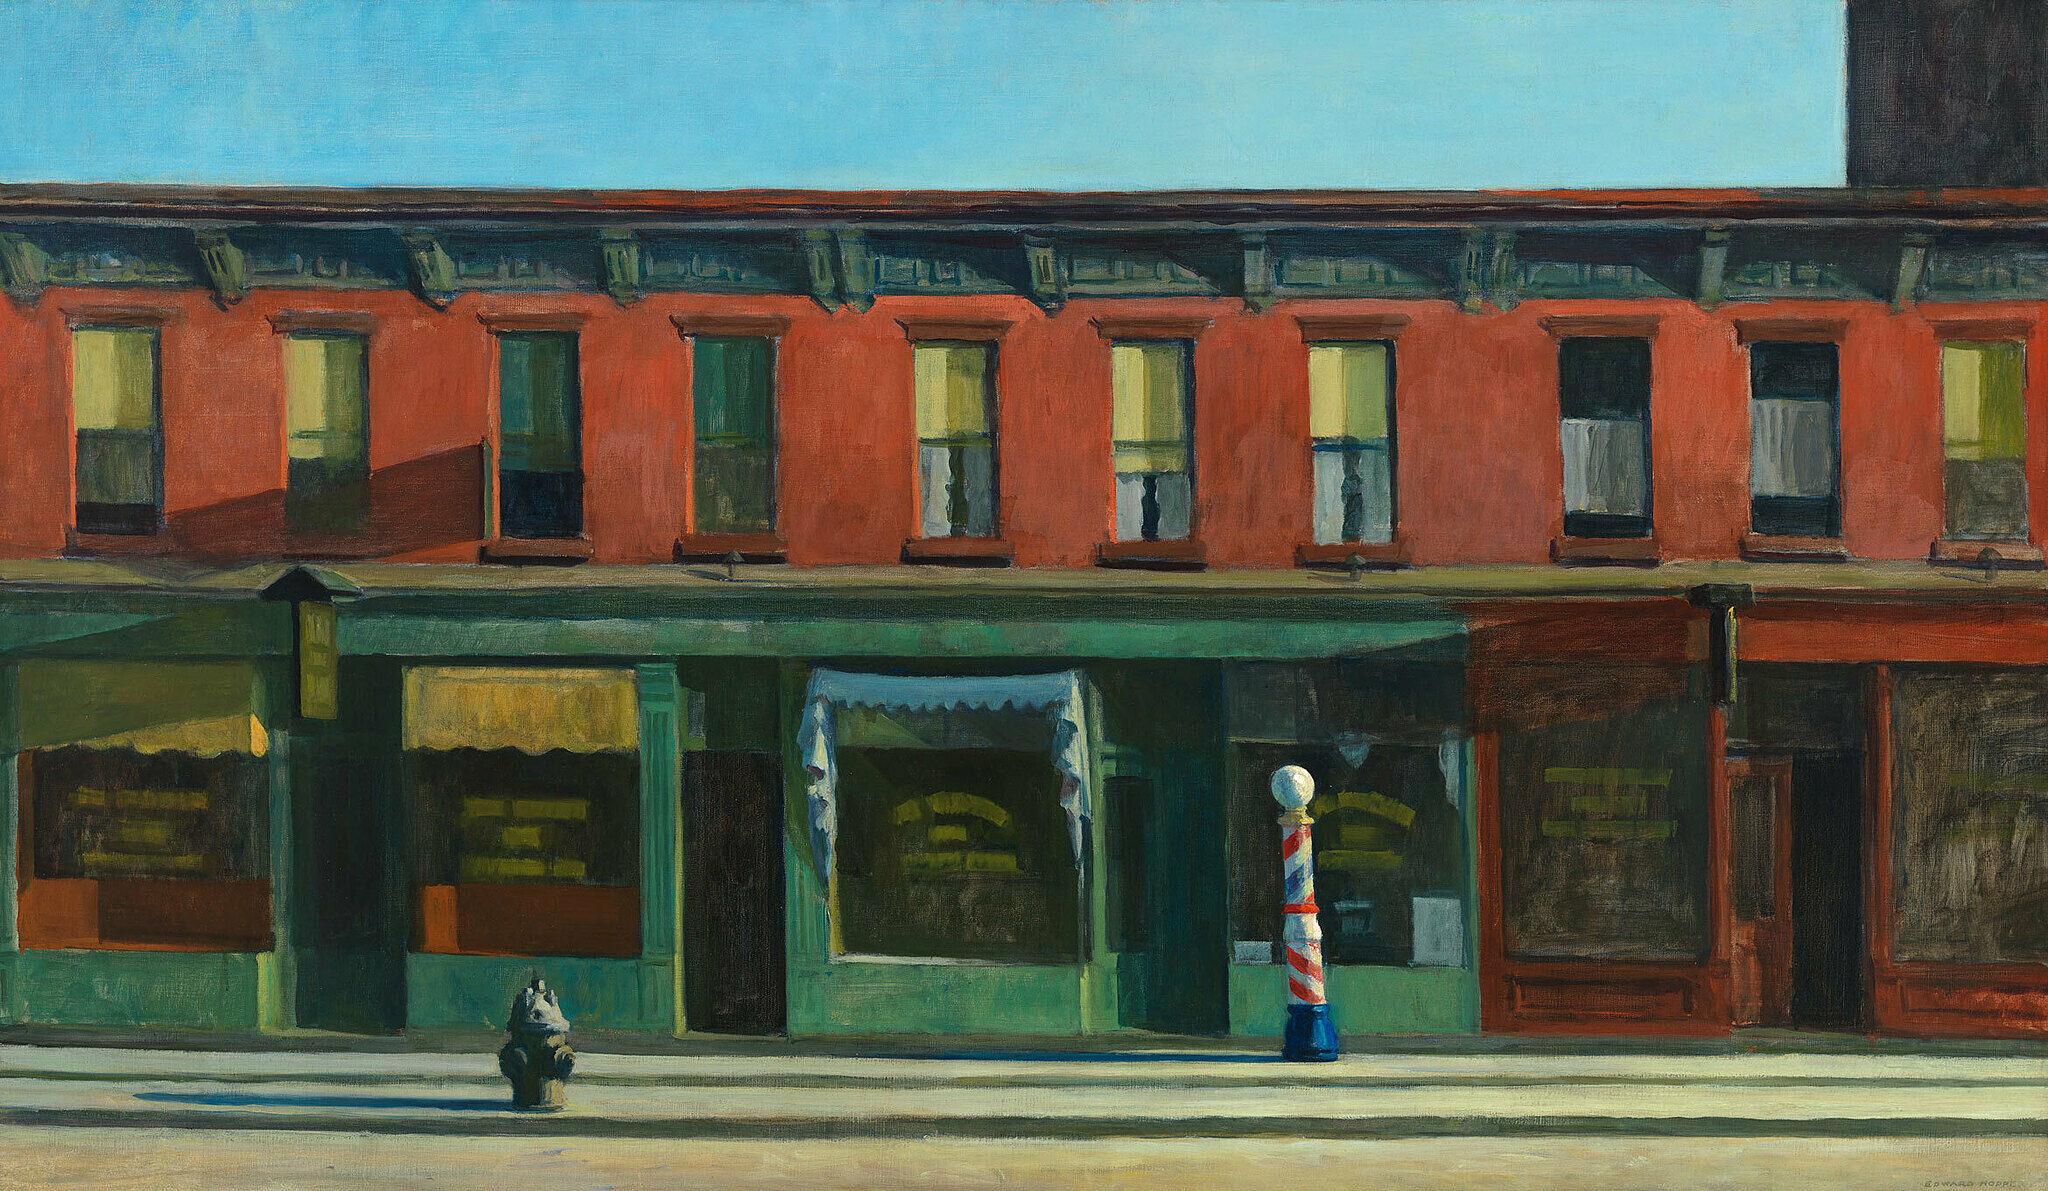 Hopper's iconic painting of empty street scene.